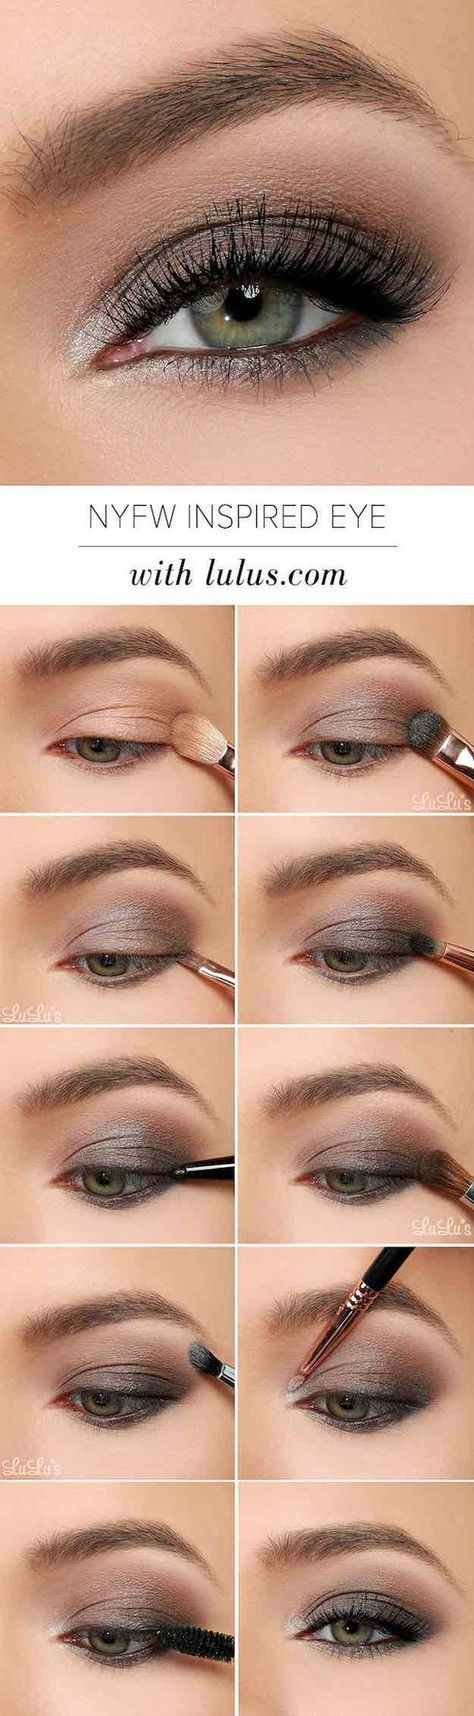 9 makeup tutorials for green eyes - amazing green eye makeup